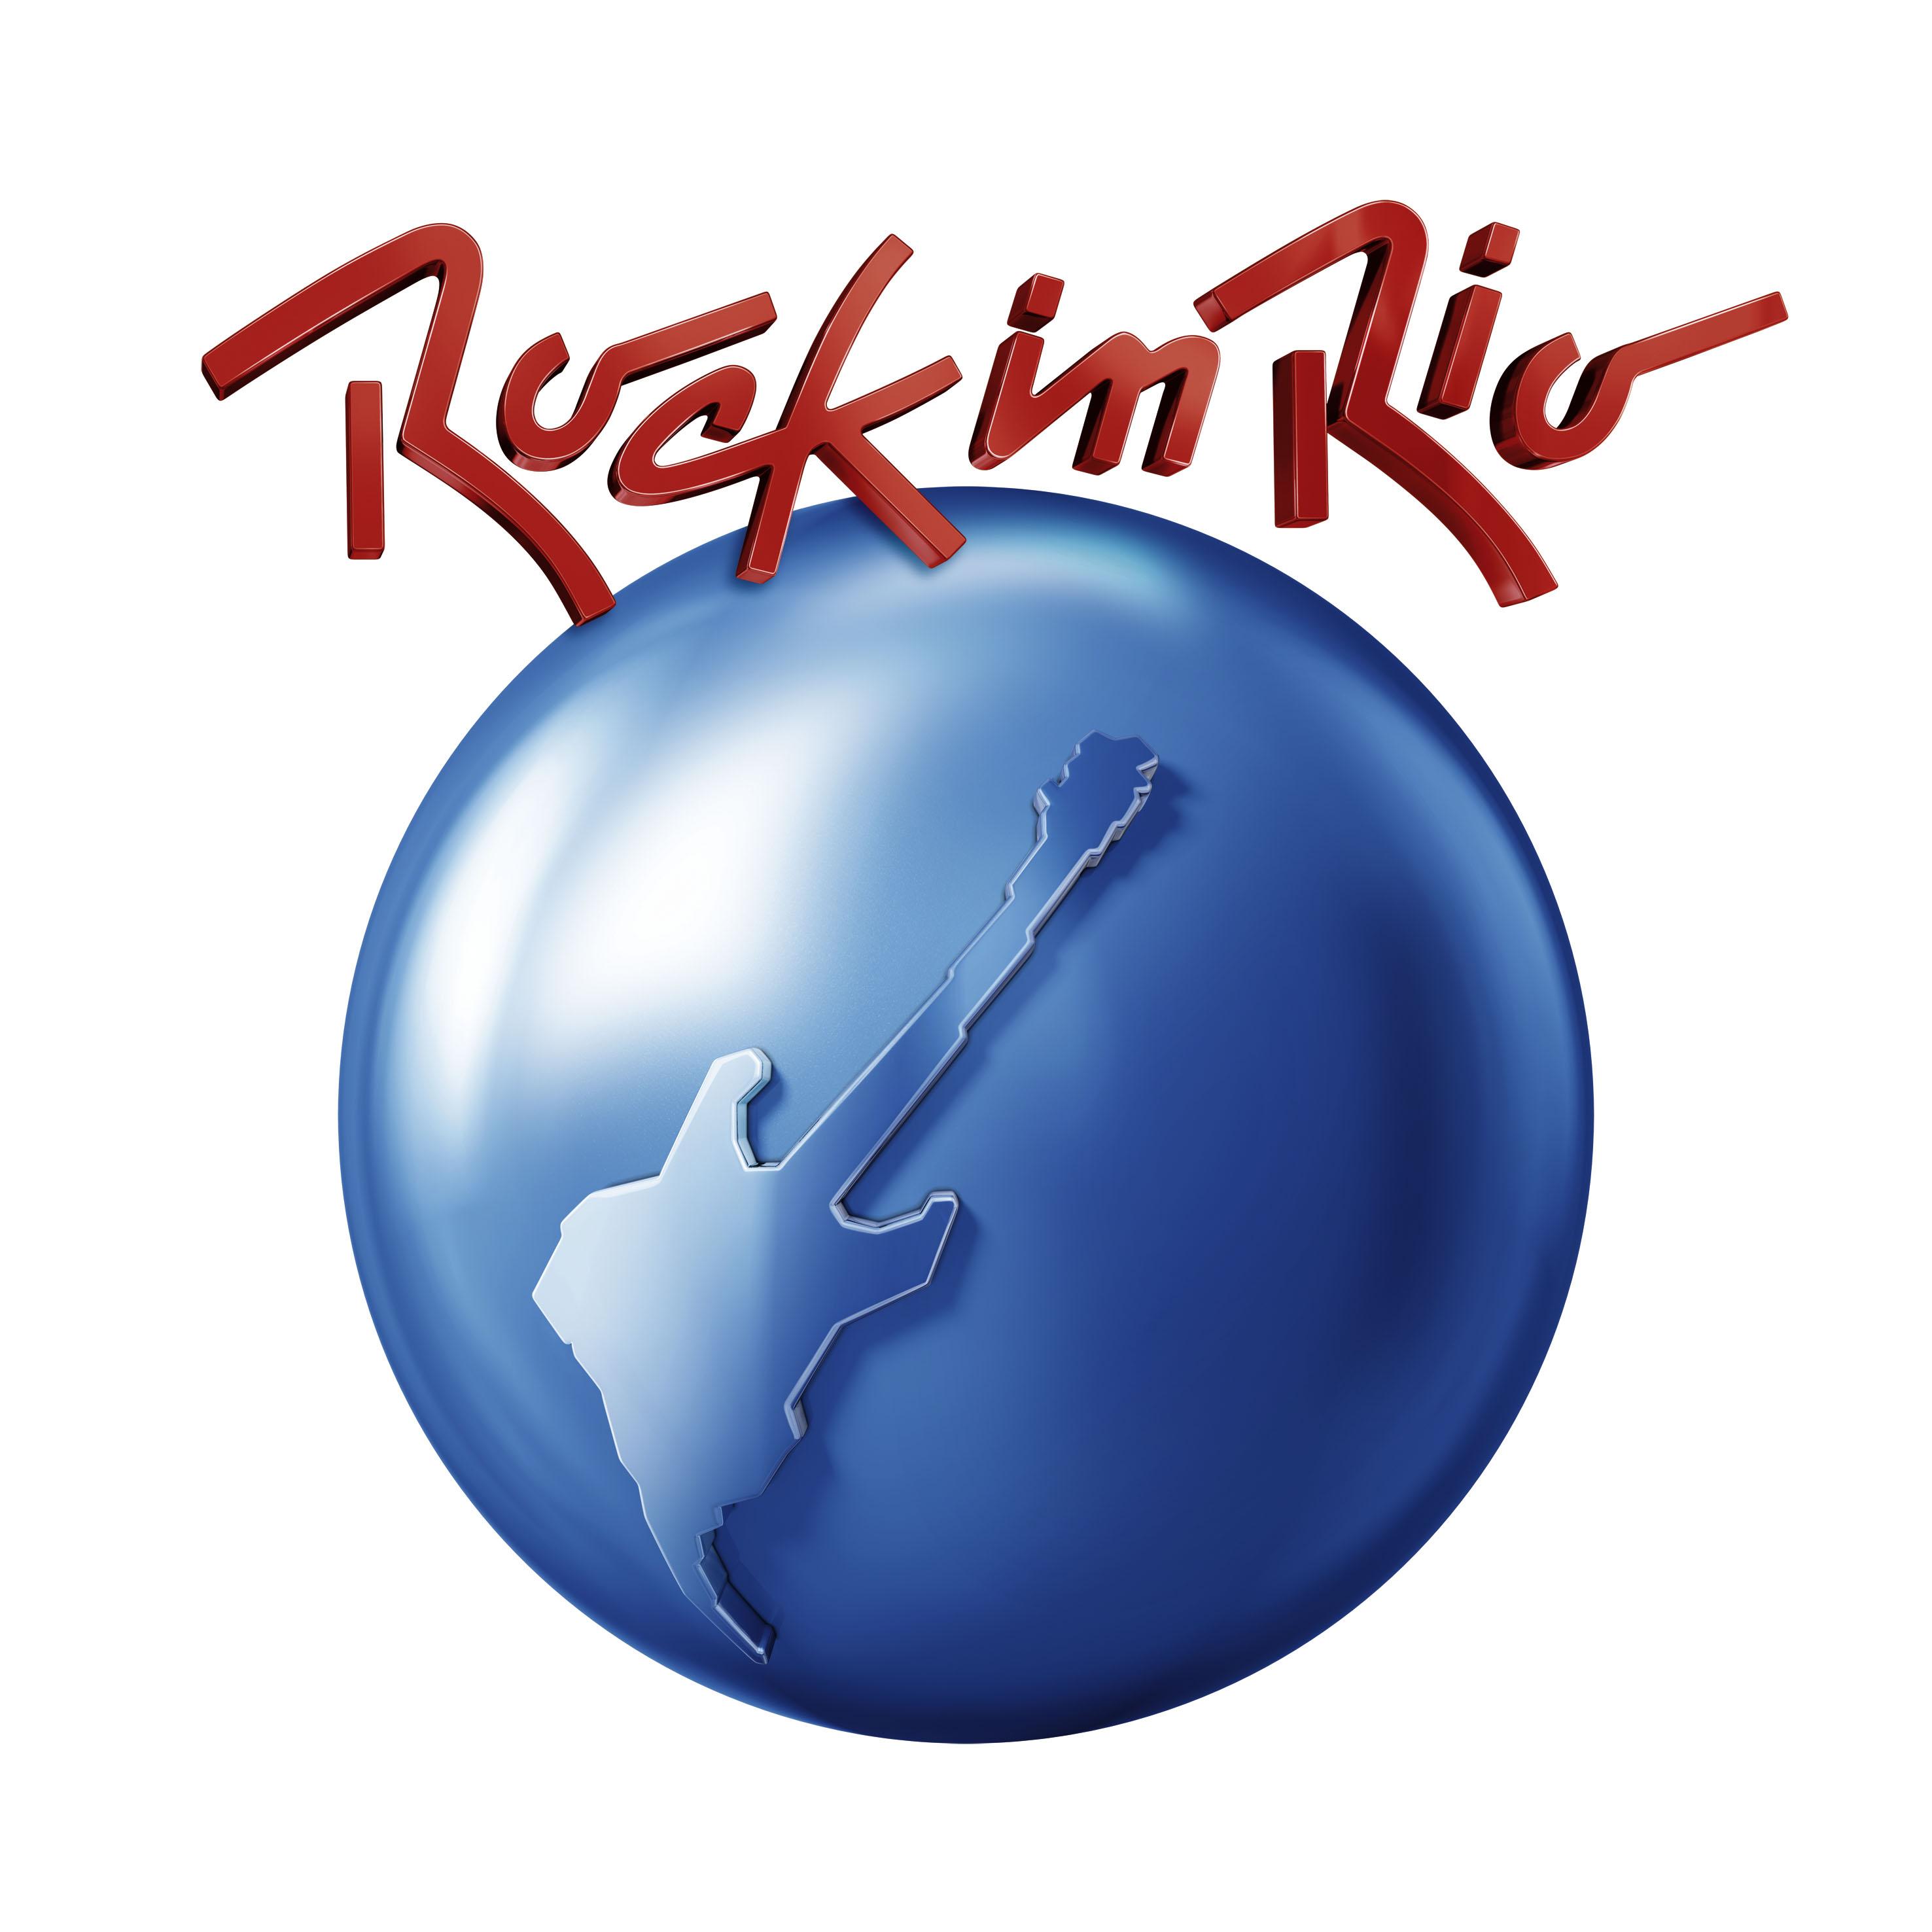 https://revistaraca.com.br/wp-content/uploads/2017/09/rock-in-rio-logo.jpg